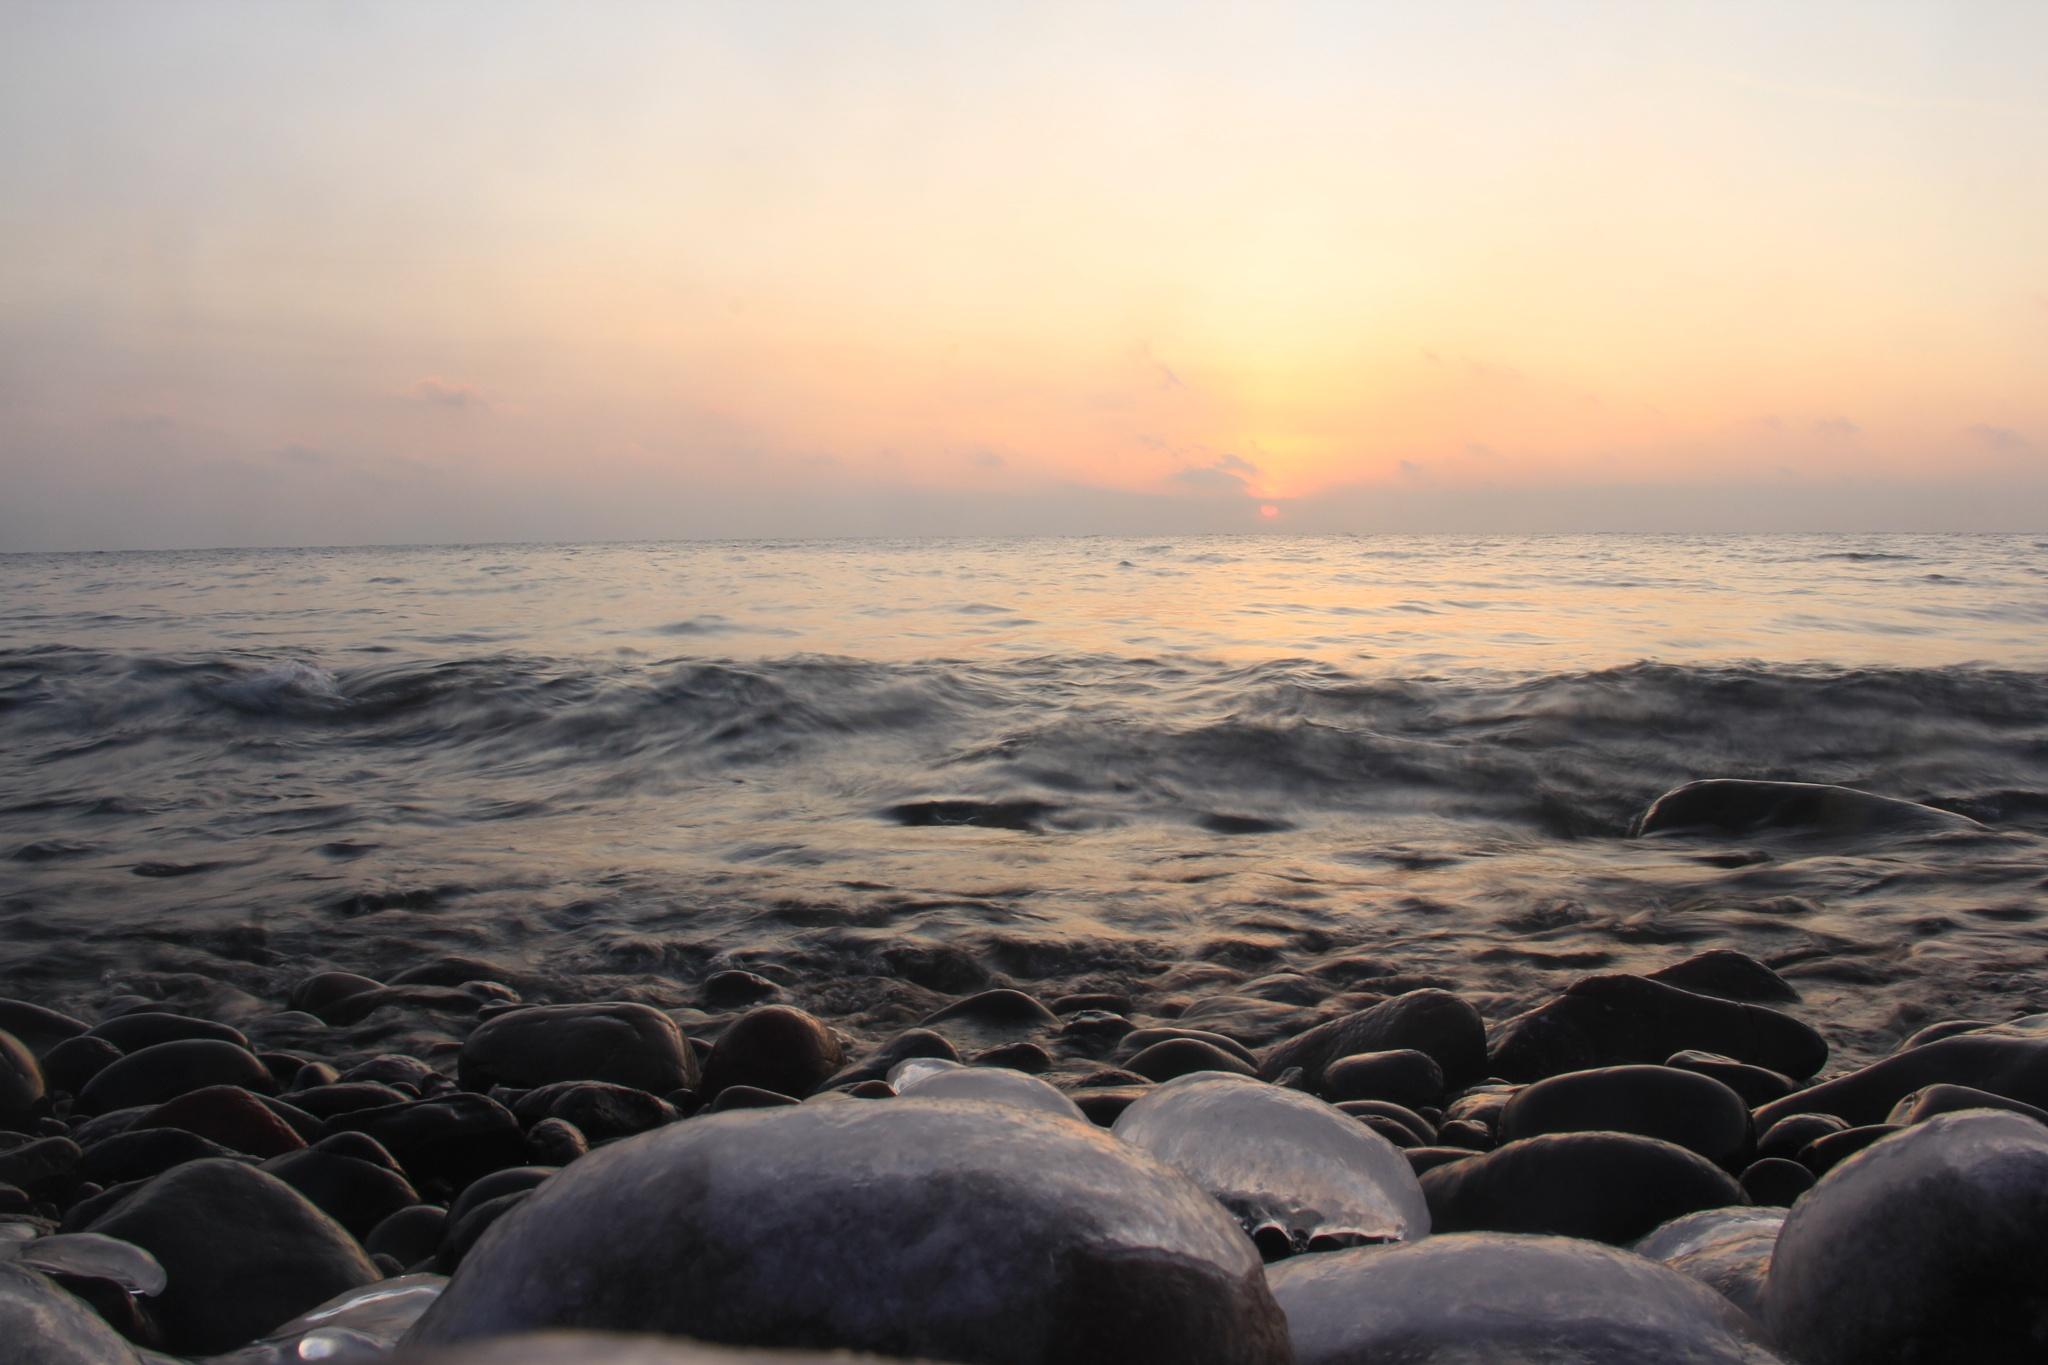 sunrise on lake superior by matthew.pastick